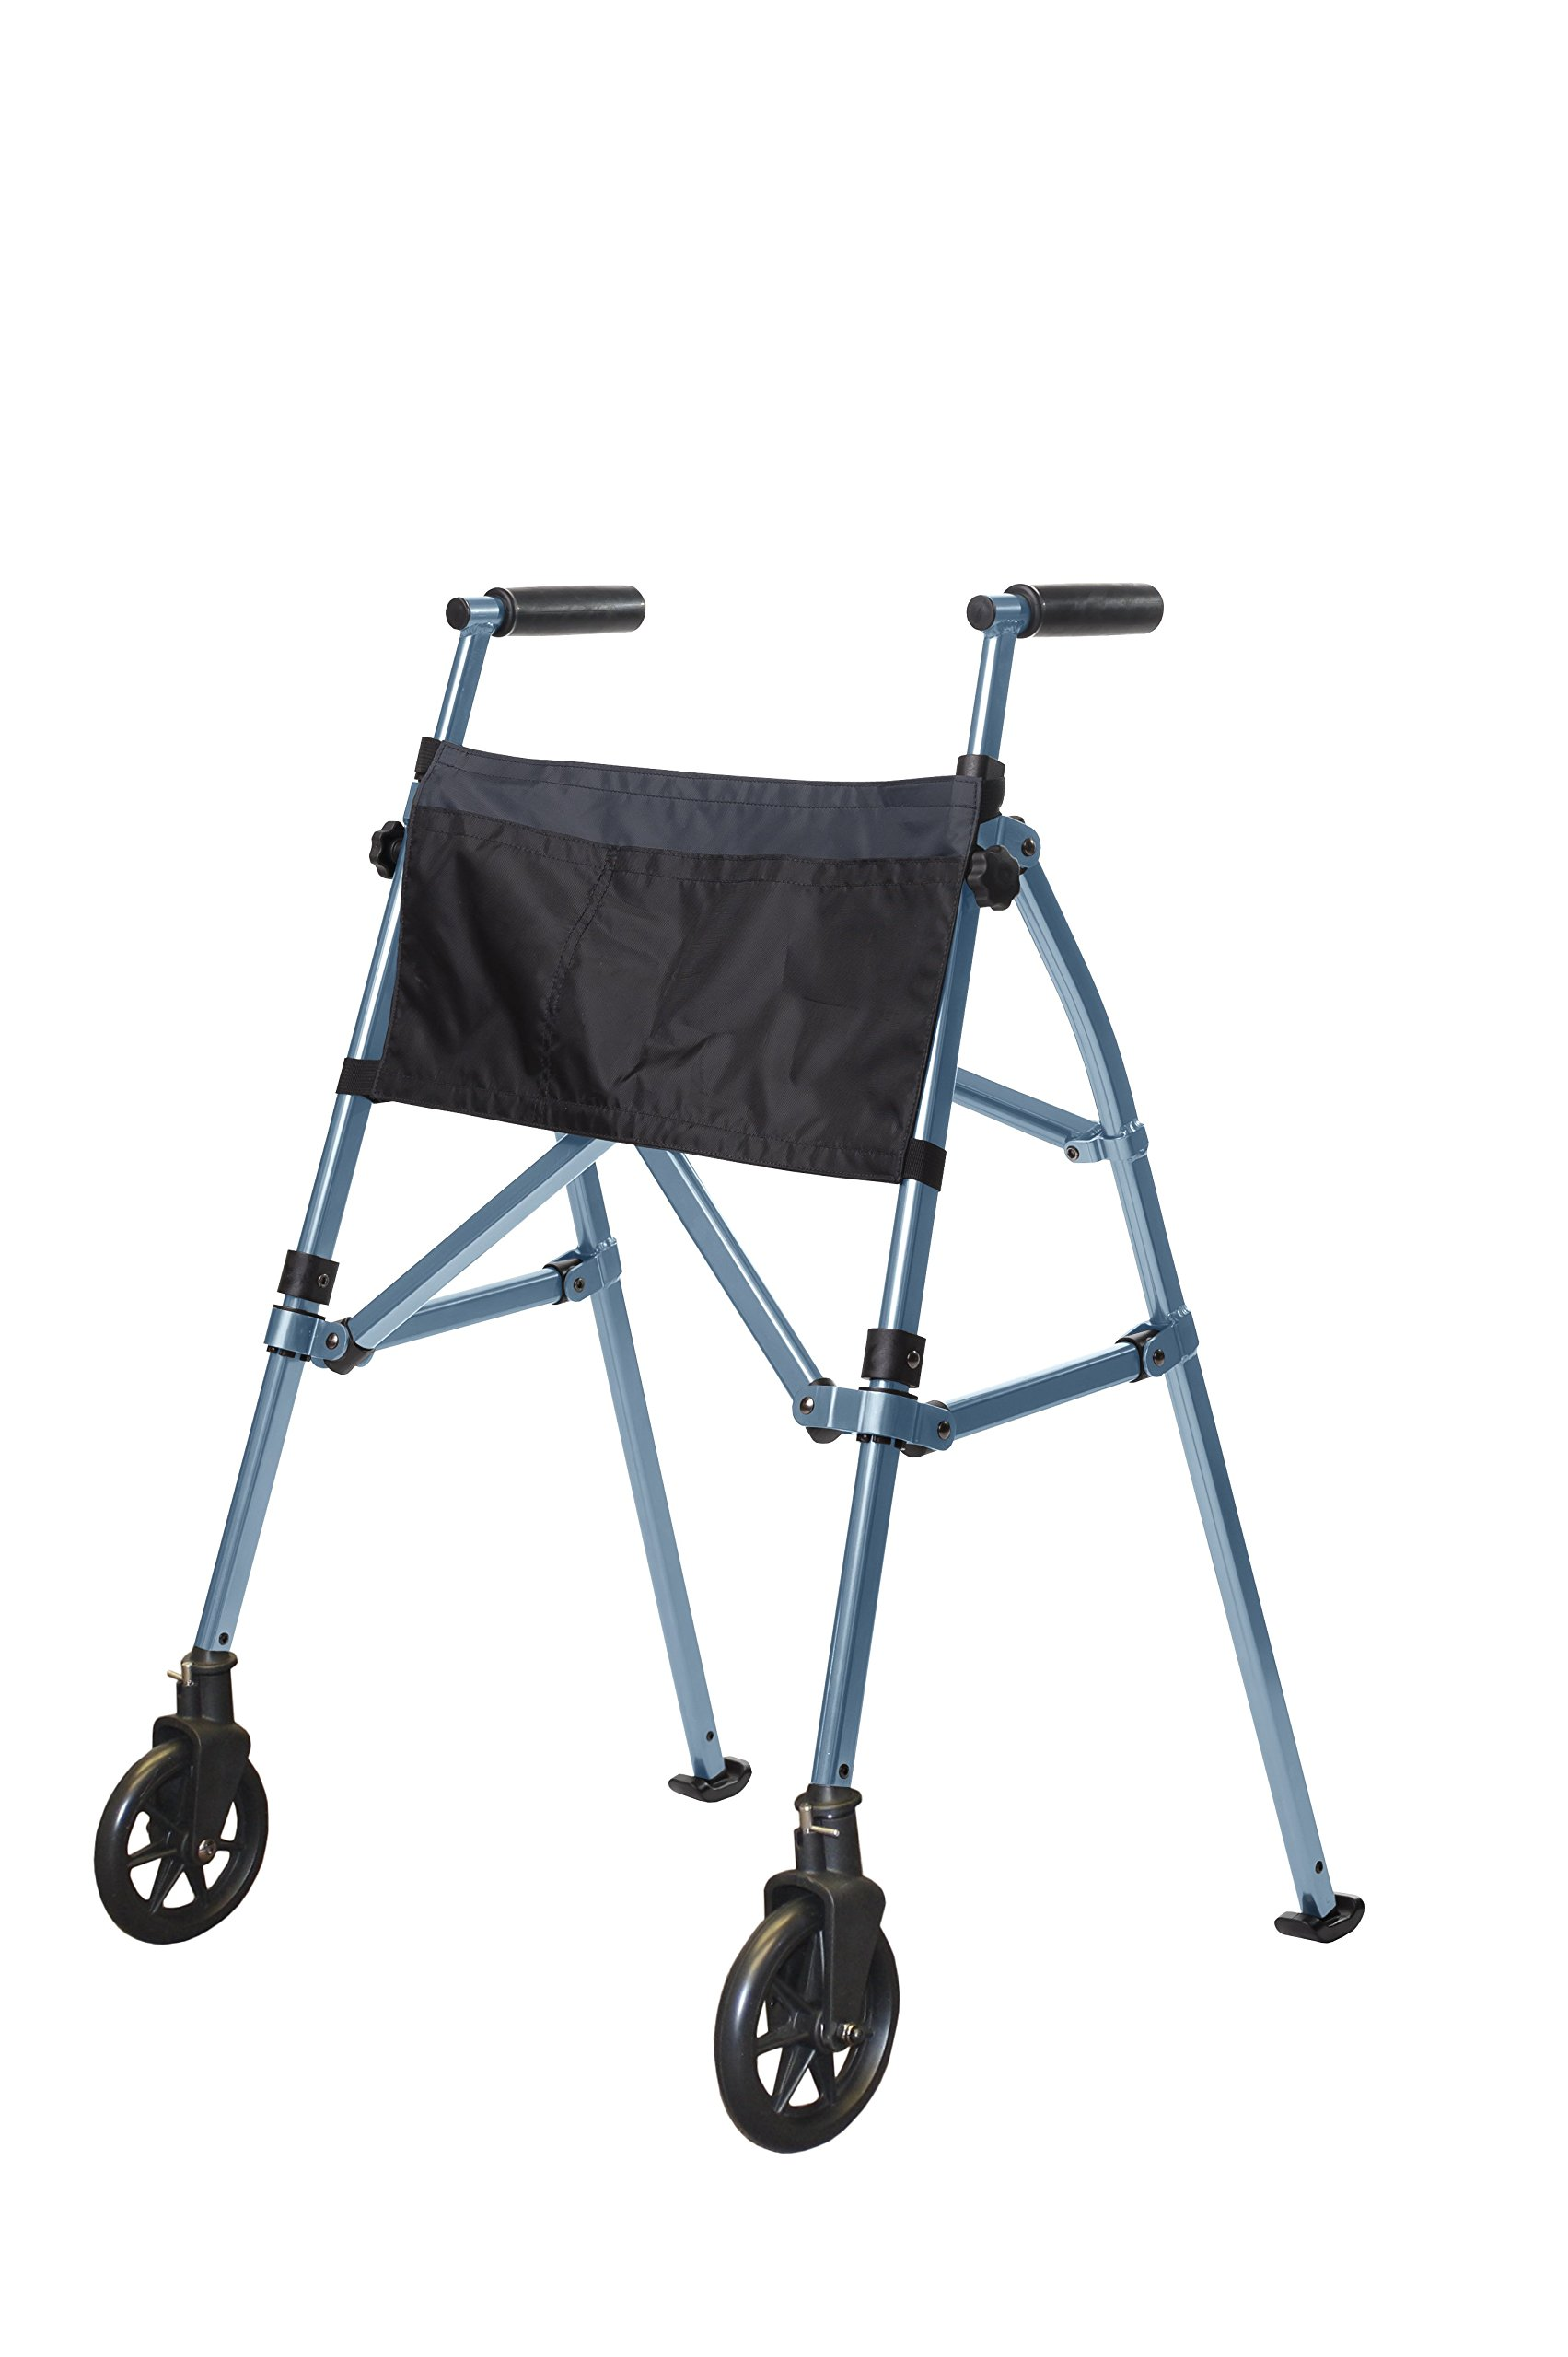 Stander EZ Fold-N-Go Walker - Lightweight Folding & Height Adjustable Adult Travel Walker for Seniors + Locking Swivel Wheels & Pouch -Cobalt Blue